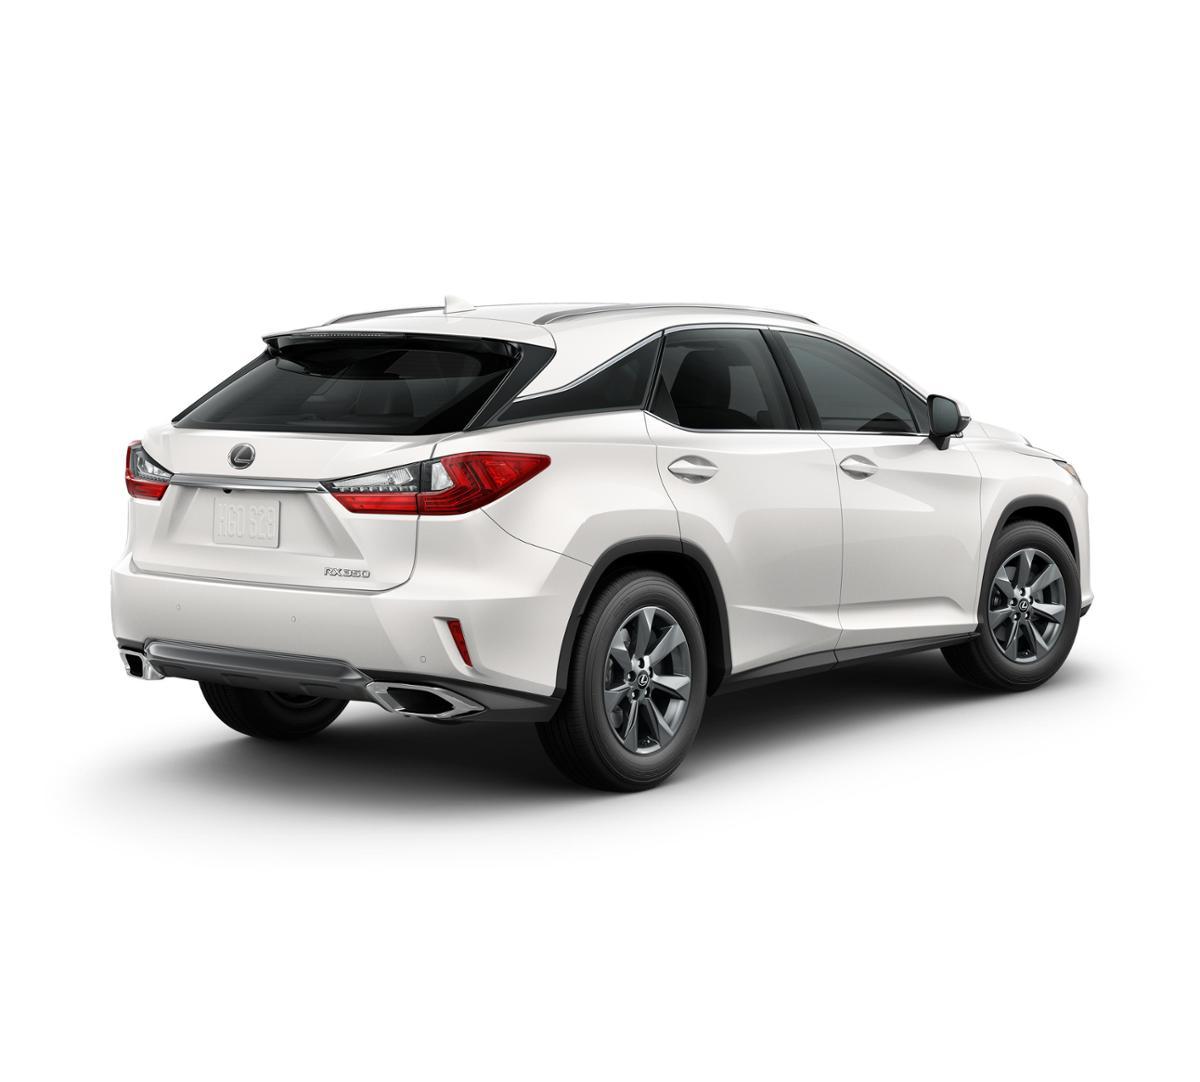 Cadillac Dealer Pembroke Pines: Oakland Eminent White Pearl 2019 Lexus RX 350 Suv For Sale